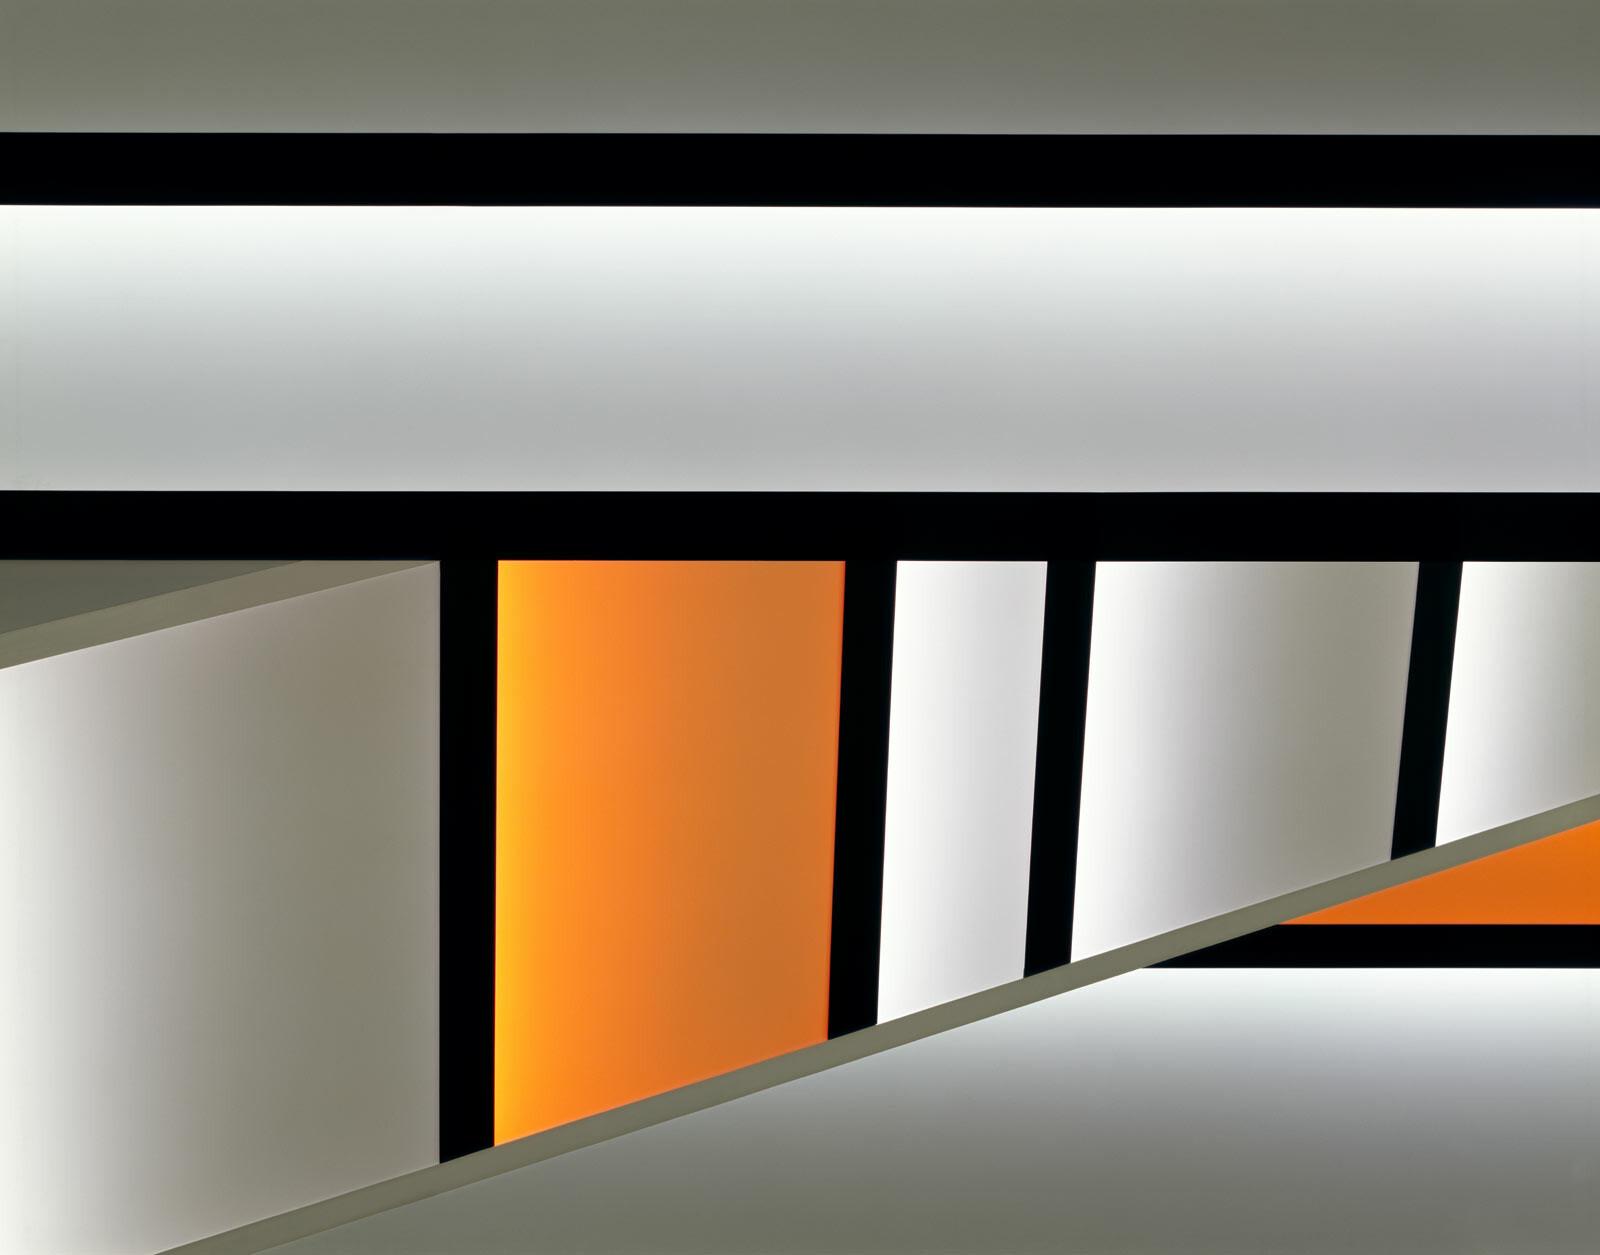 Staircase orange - Adam Mørk